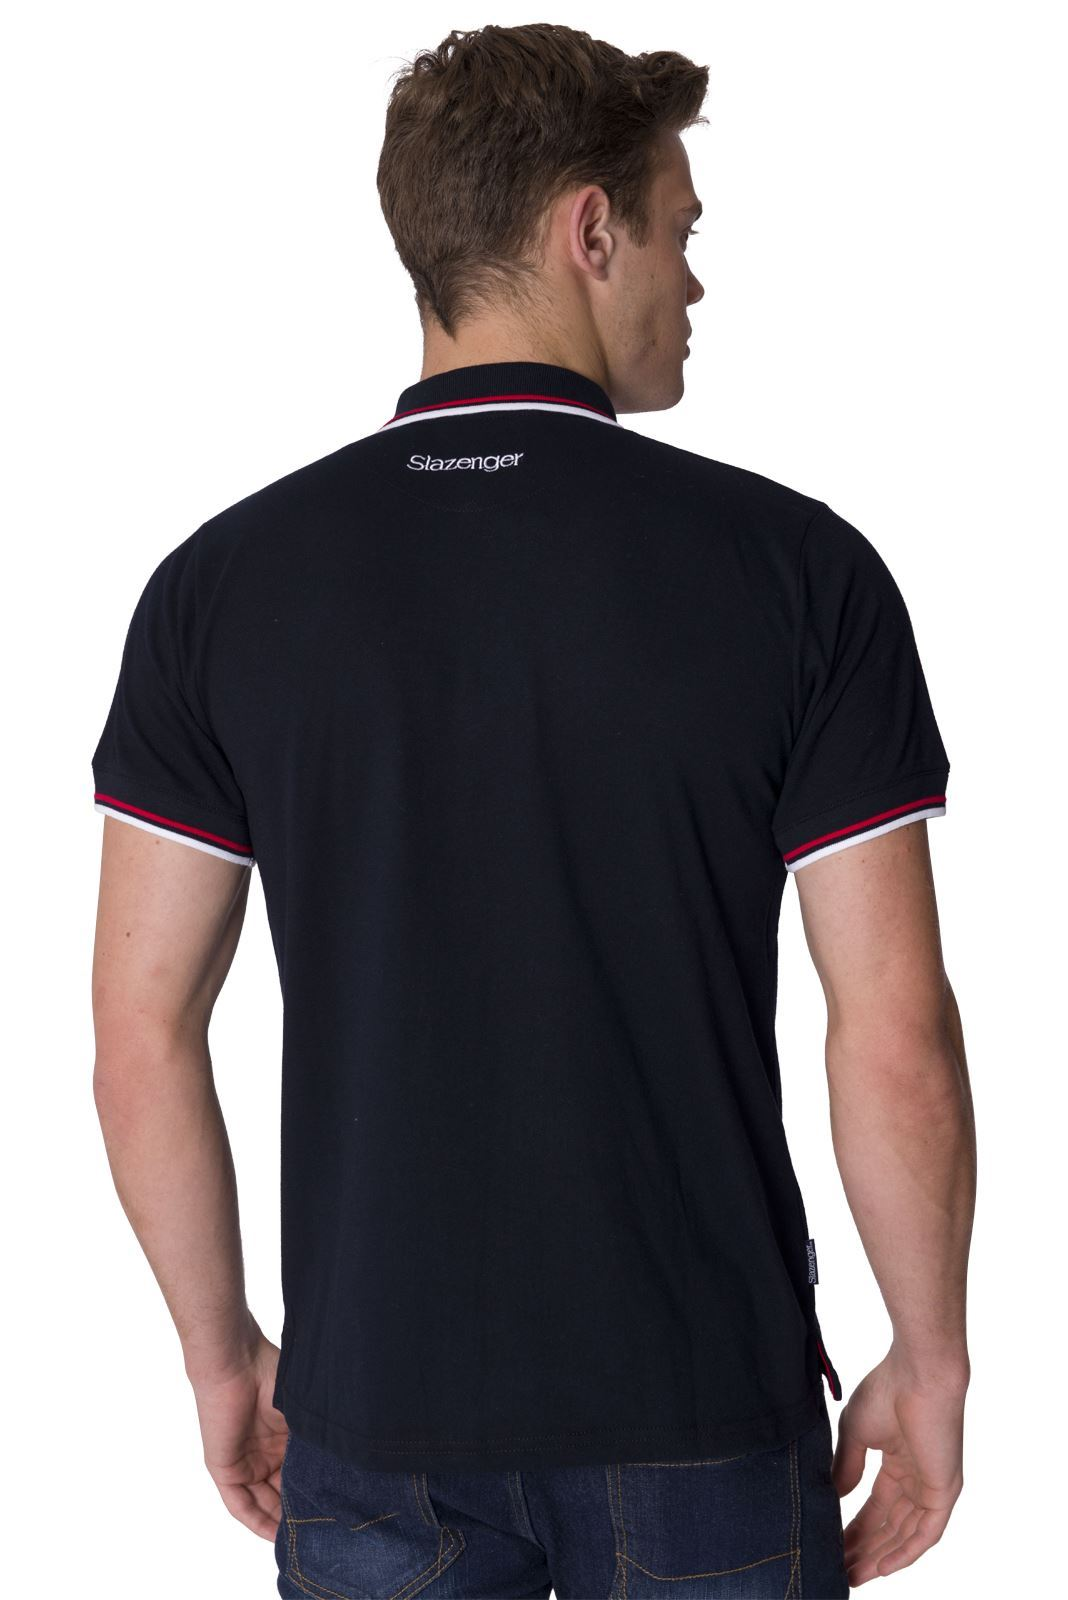 Slazenger designer new mens short sleeve collared polo tee for Xxl mens polo shirts